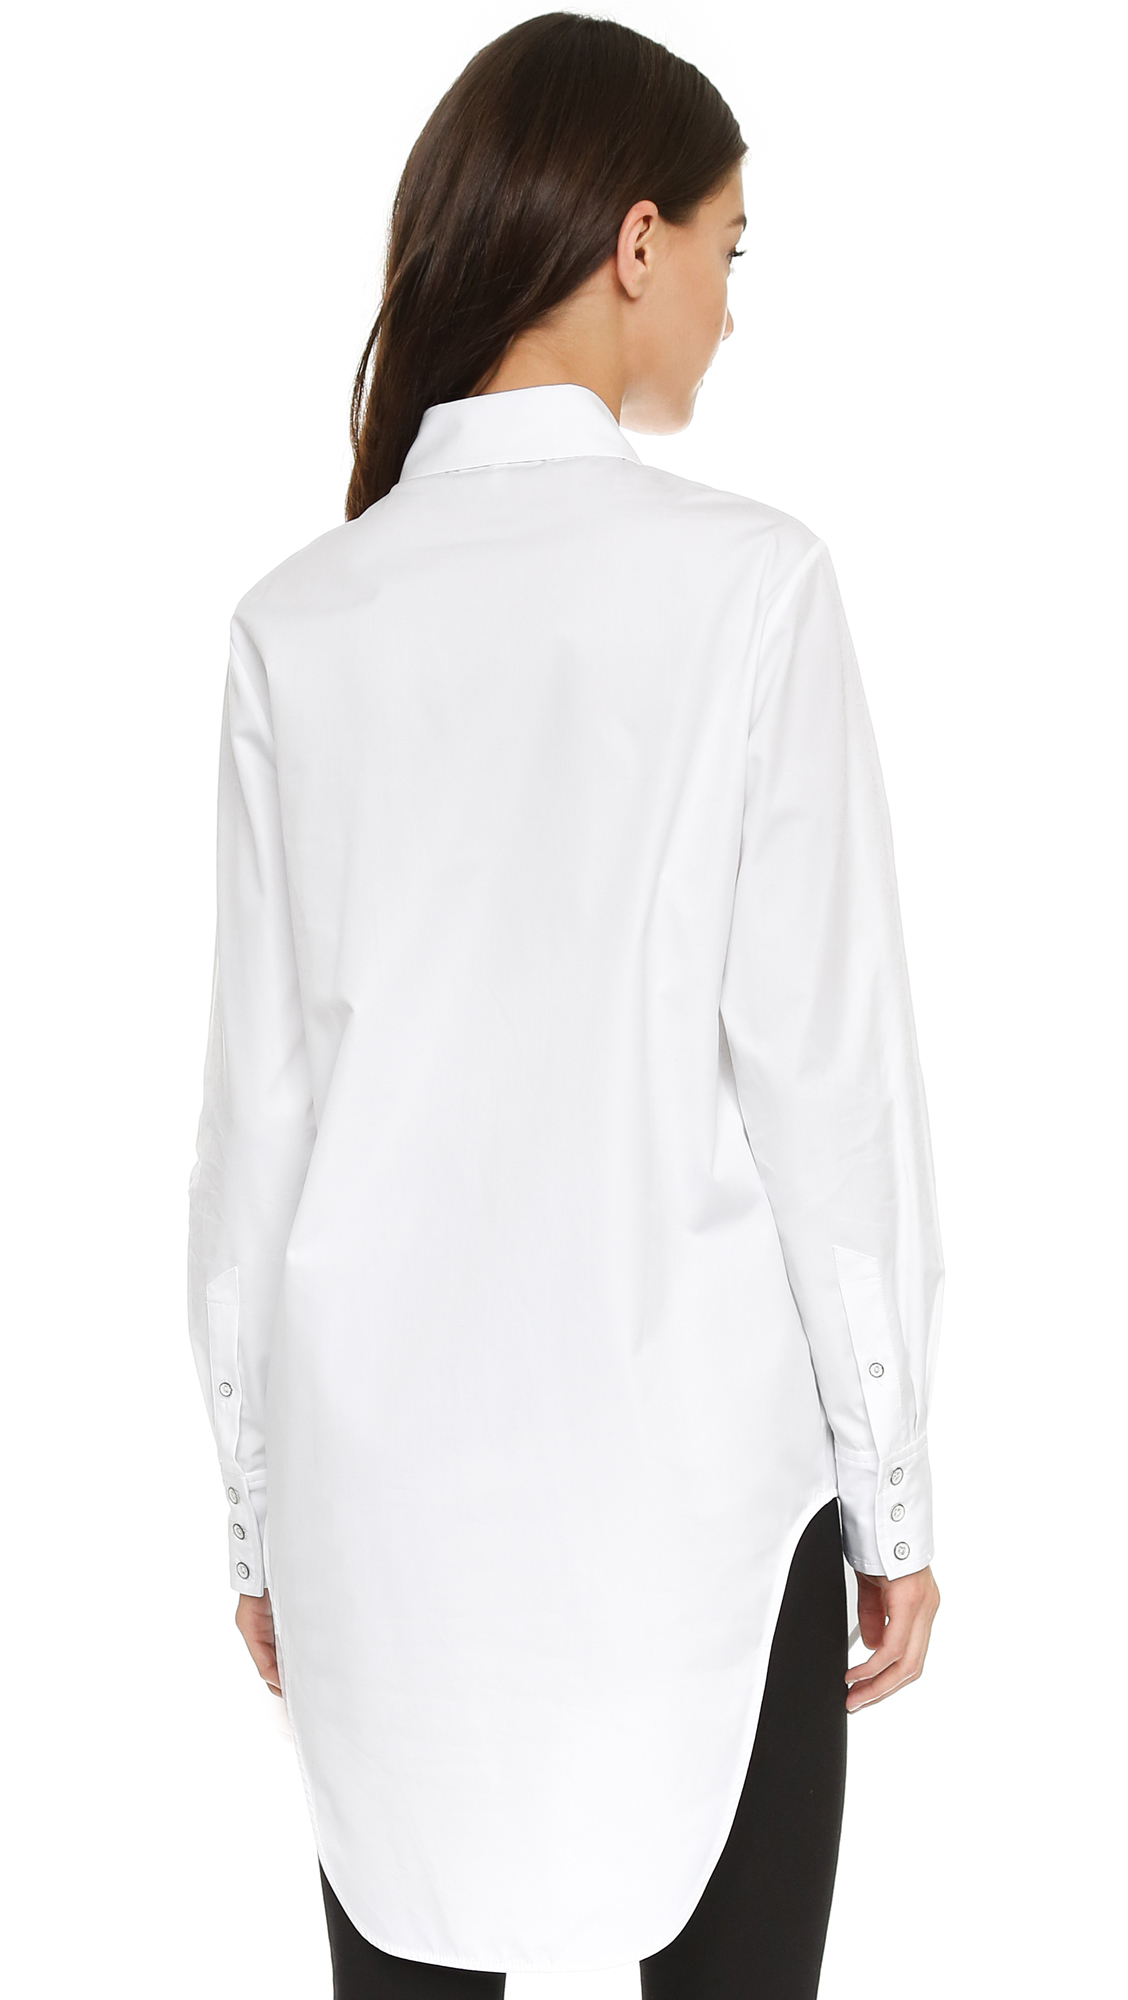 Lyst rag bone nightingale shirt in white for Rag bone shirt